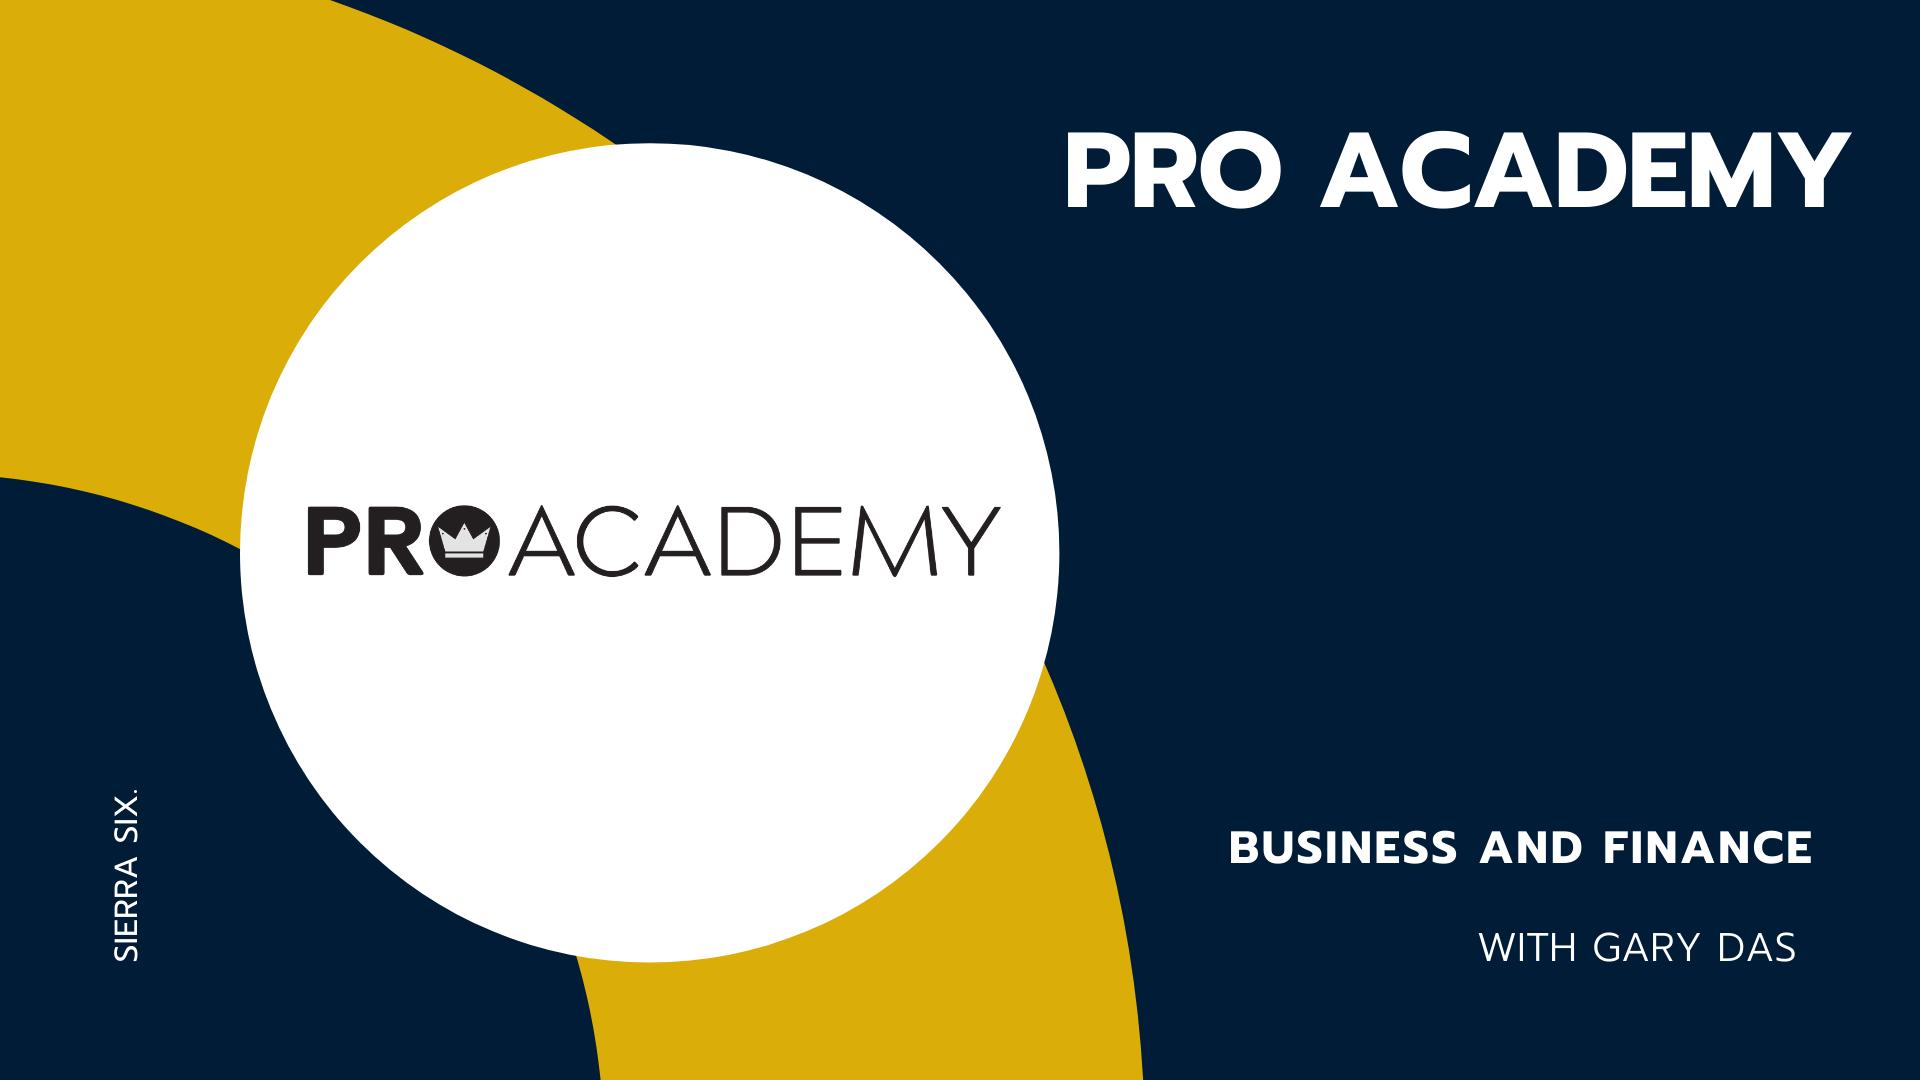 Sierra Six Media, SEO agency educational workshops: Pro Academy